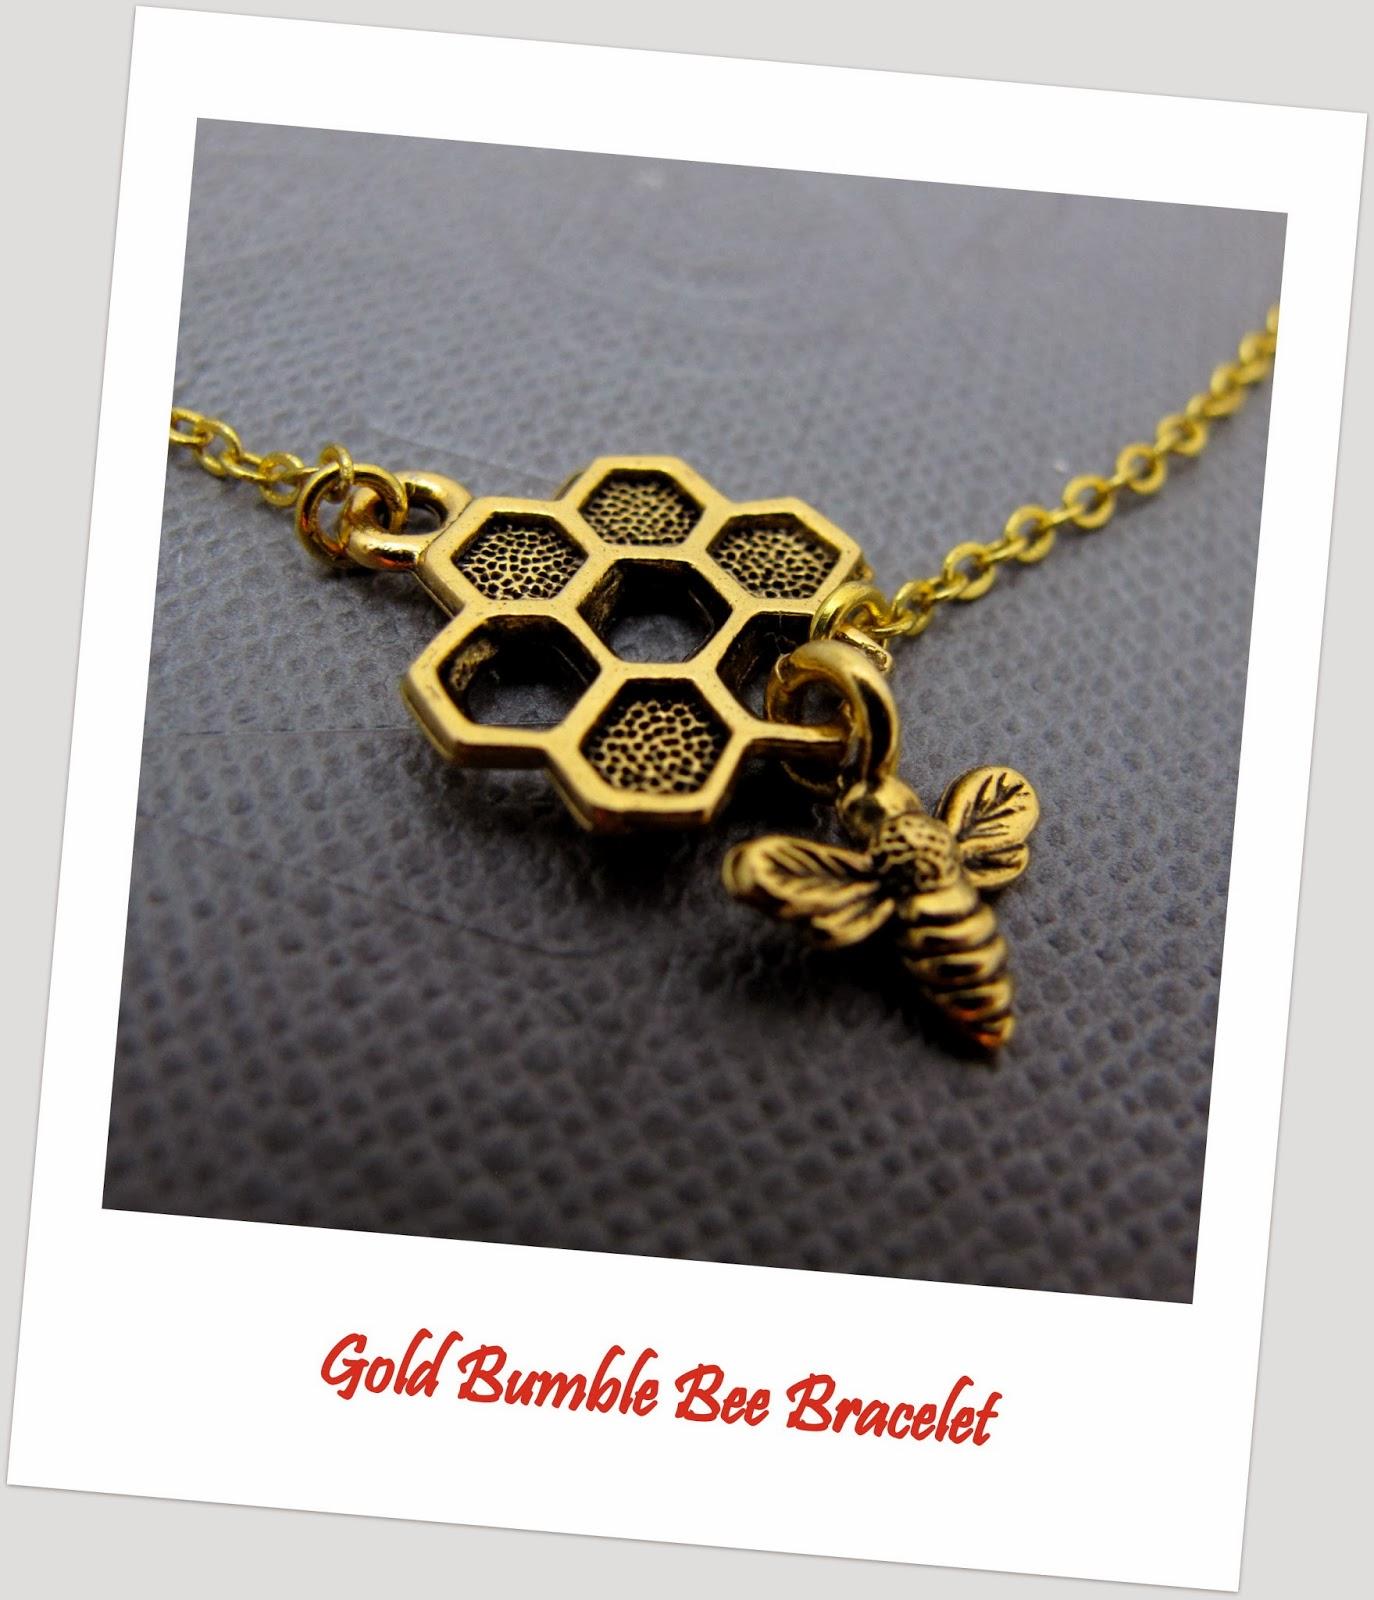 https://www.etsy.com/sg-en/listing/155360572/gold-bumble-bee-bracelet-dangle